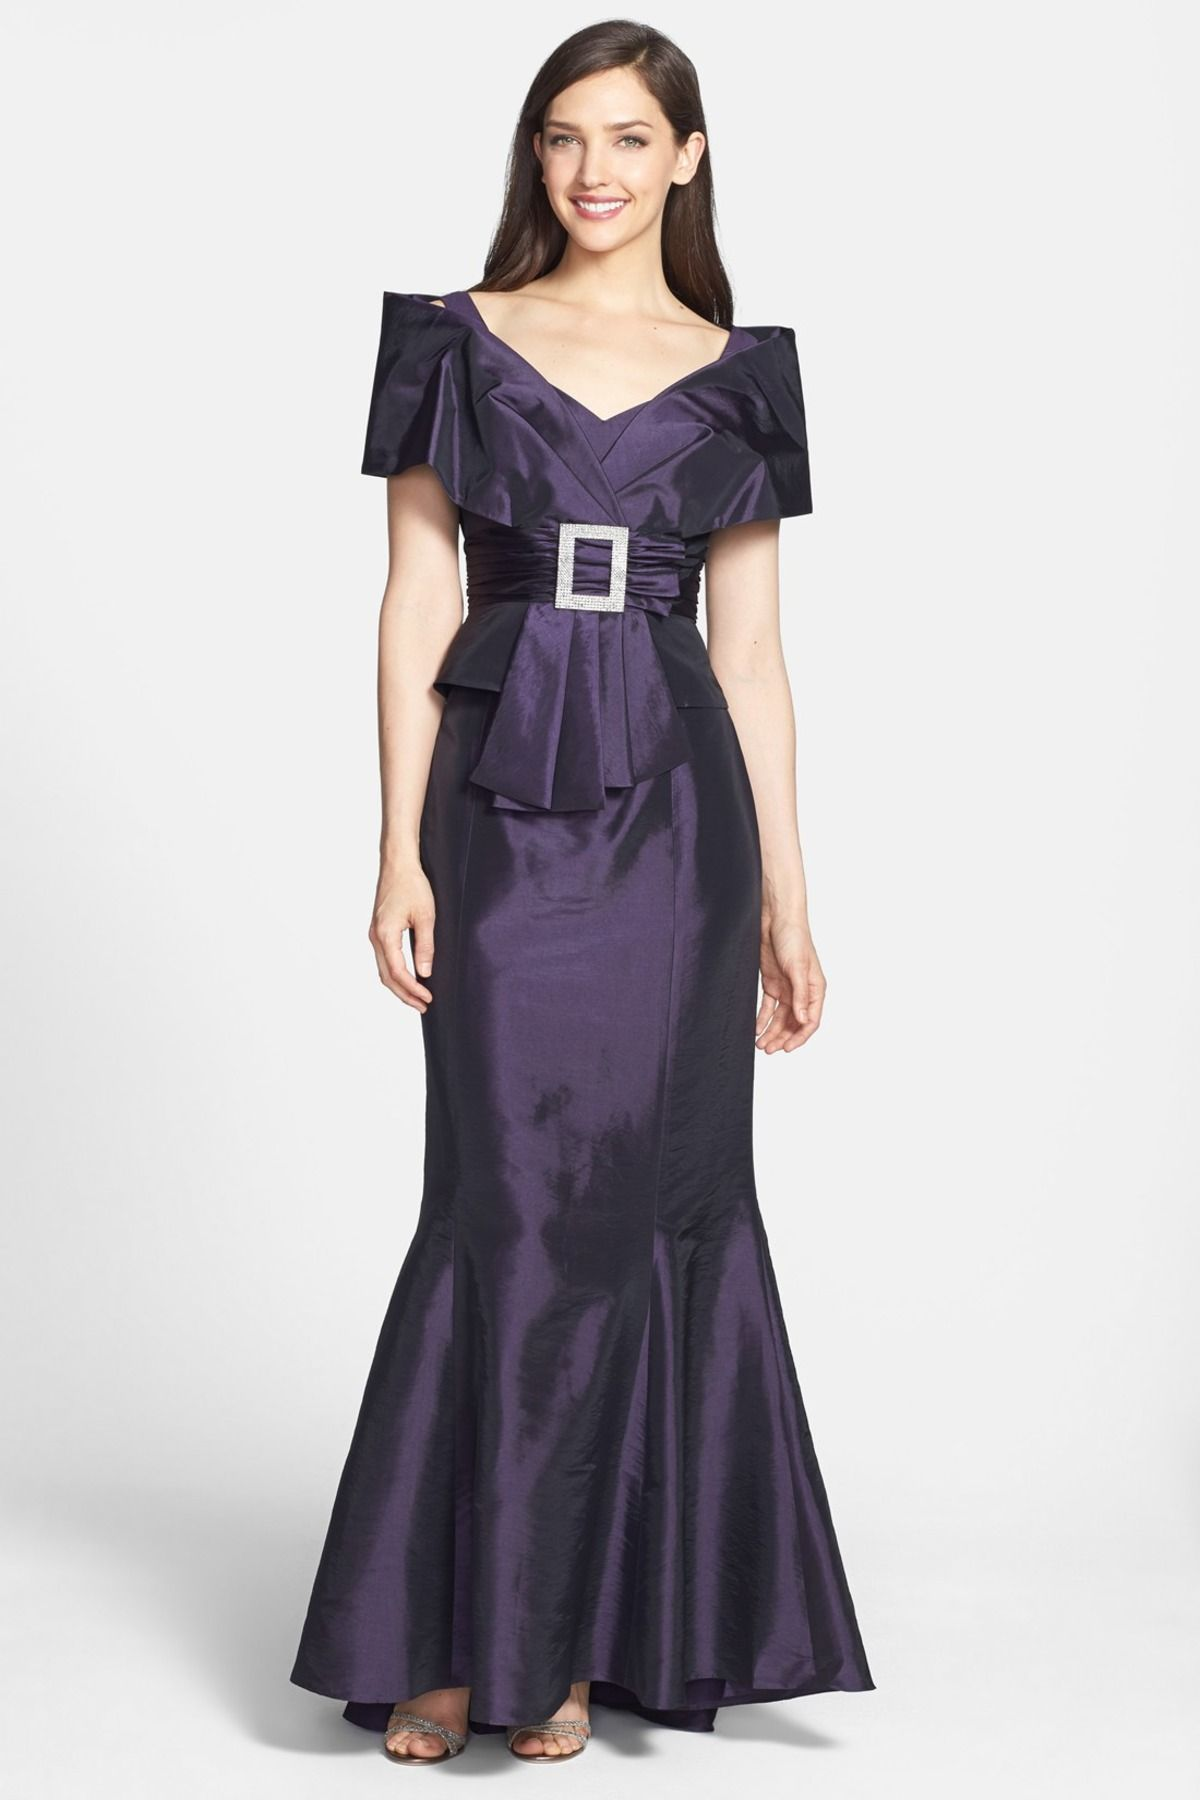 Mother of the bride wedding dresses nordstrom  Taffeta Jacket with Trumpet Skirt  Fashion  Pinterest  Trumpets